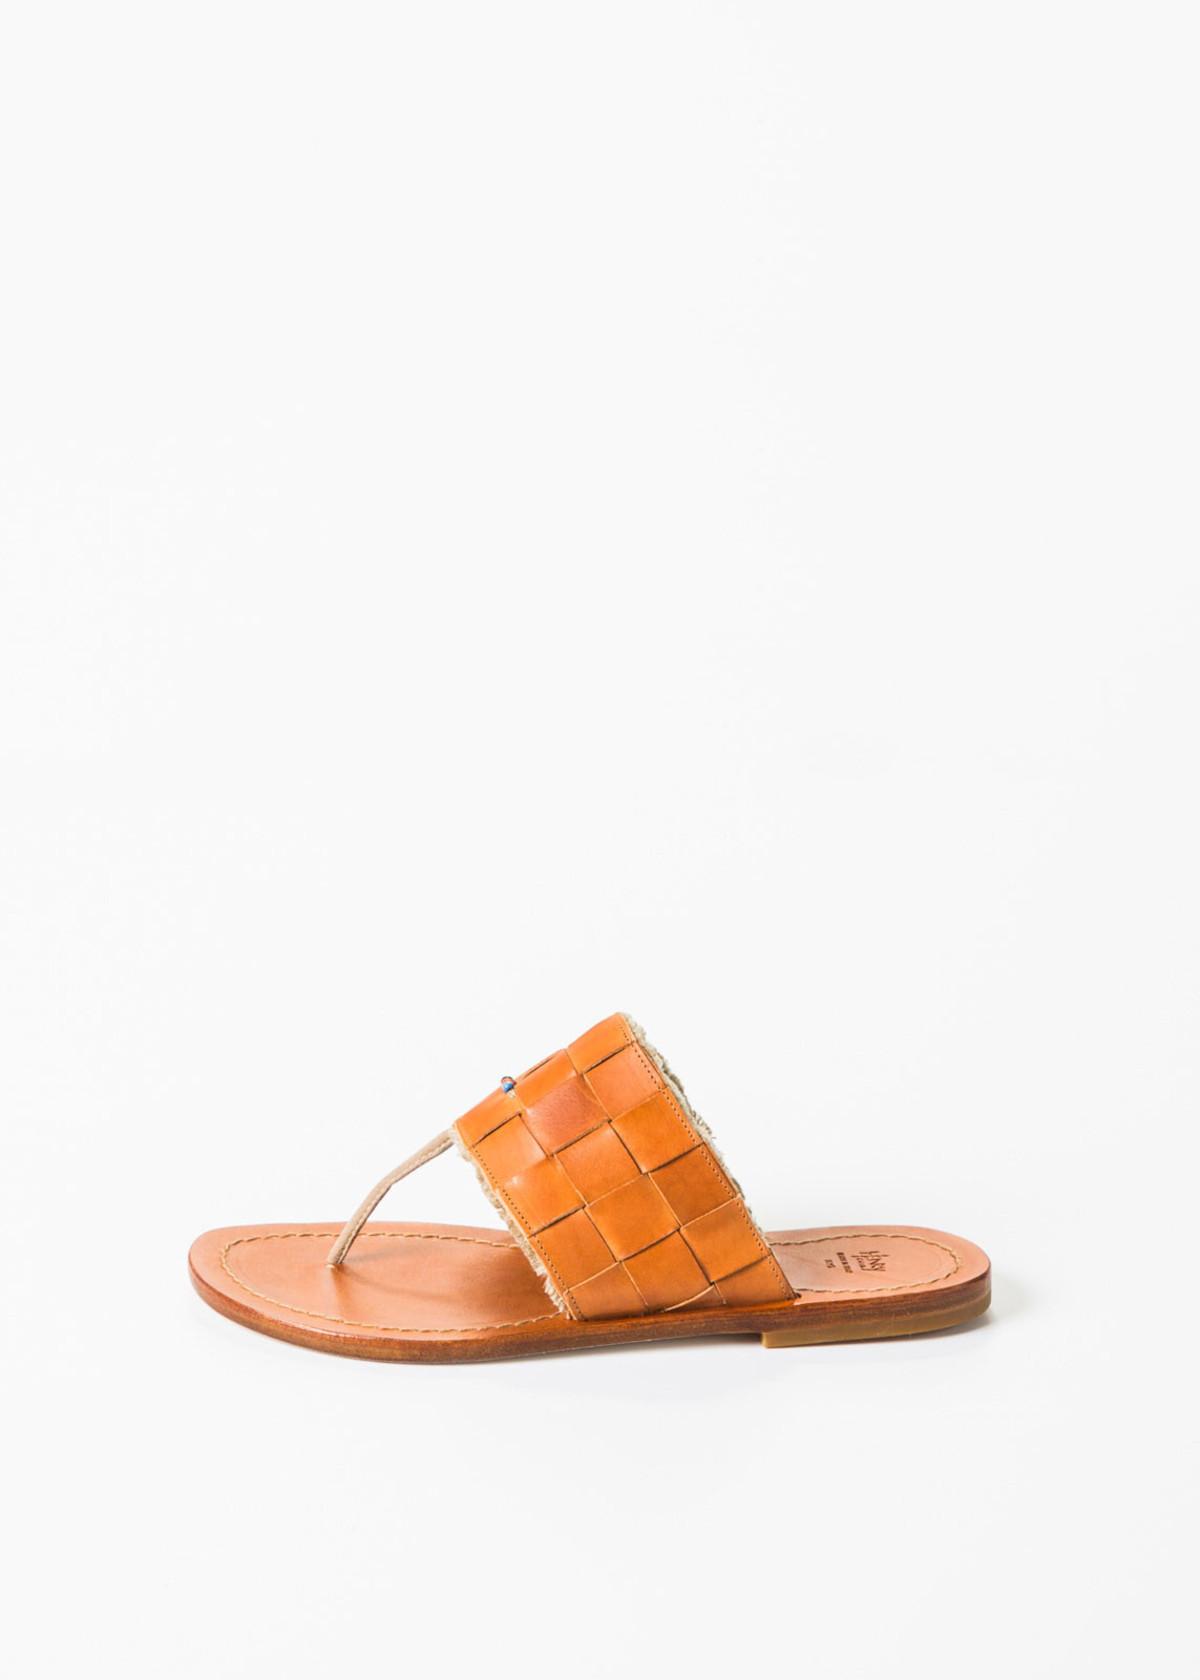 Henry Cuir Woven Slide Sandals official footlocker finishline buy cheap for sale cheap price outlet XNP3jo